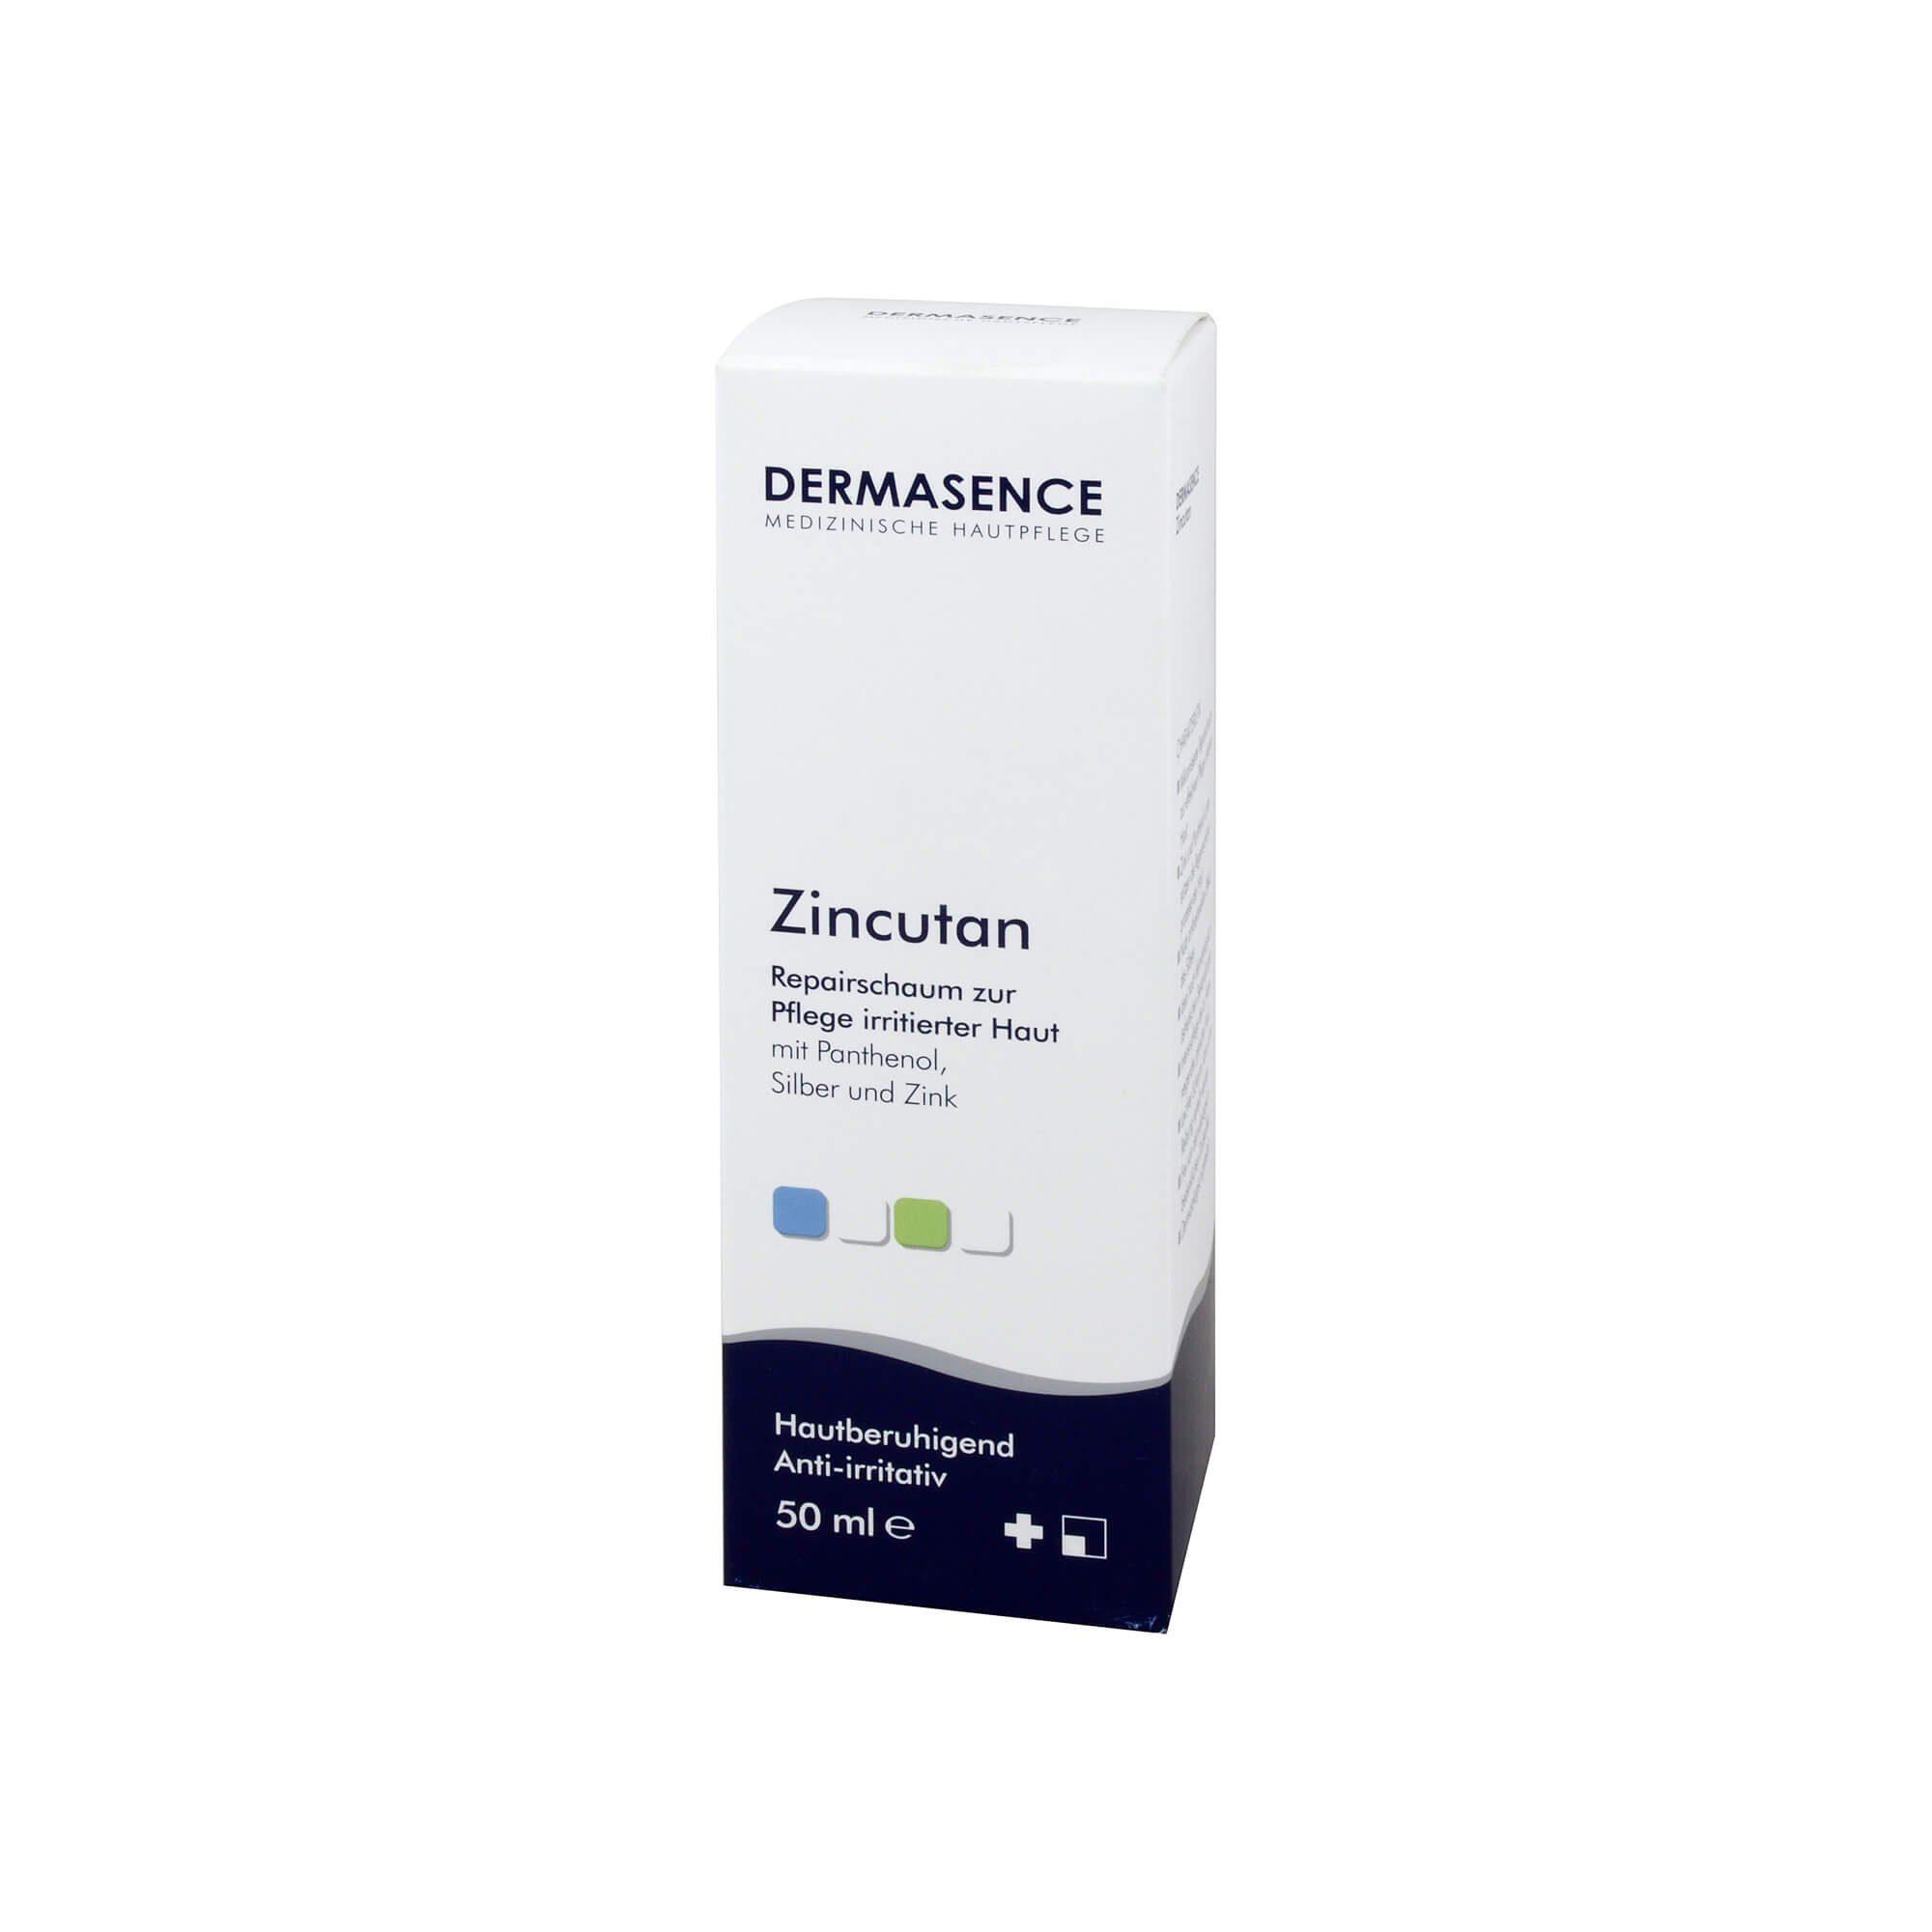 Dermasence Zincutan (, 50 ml)